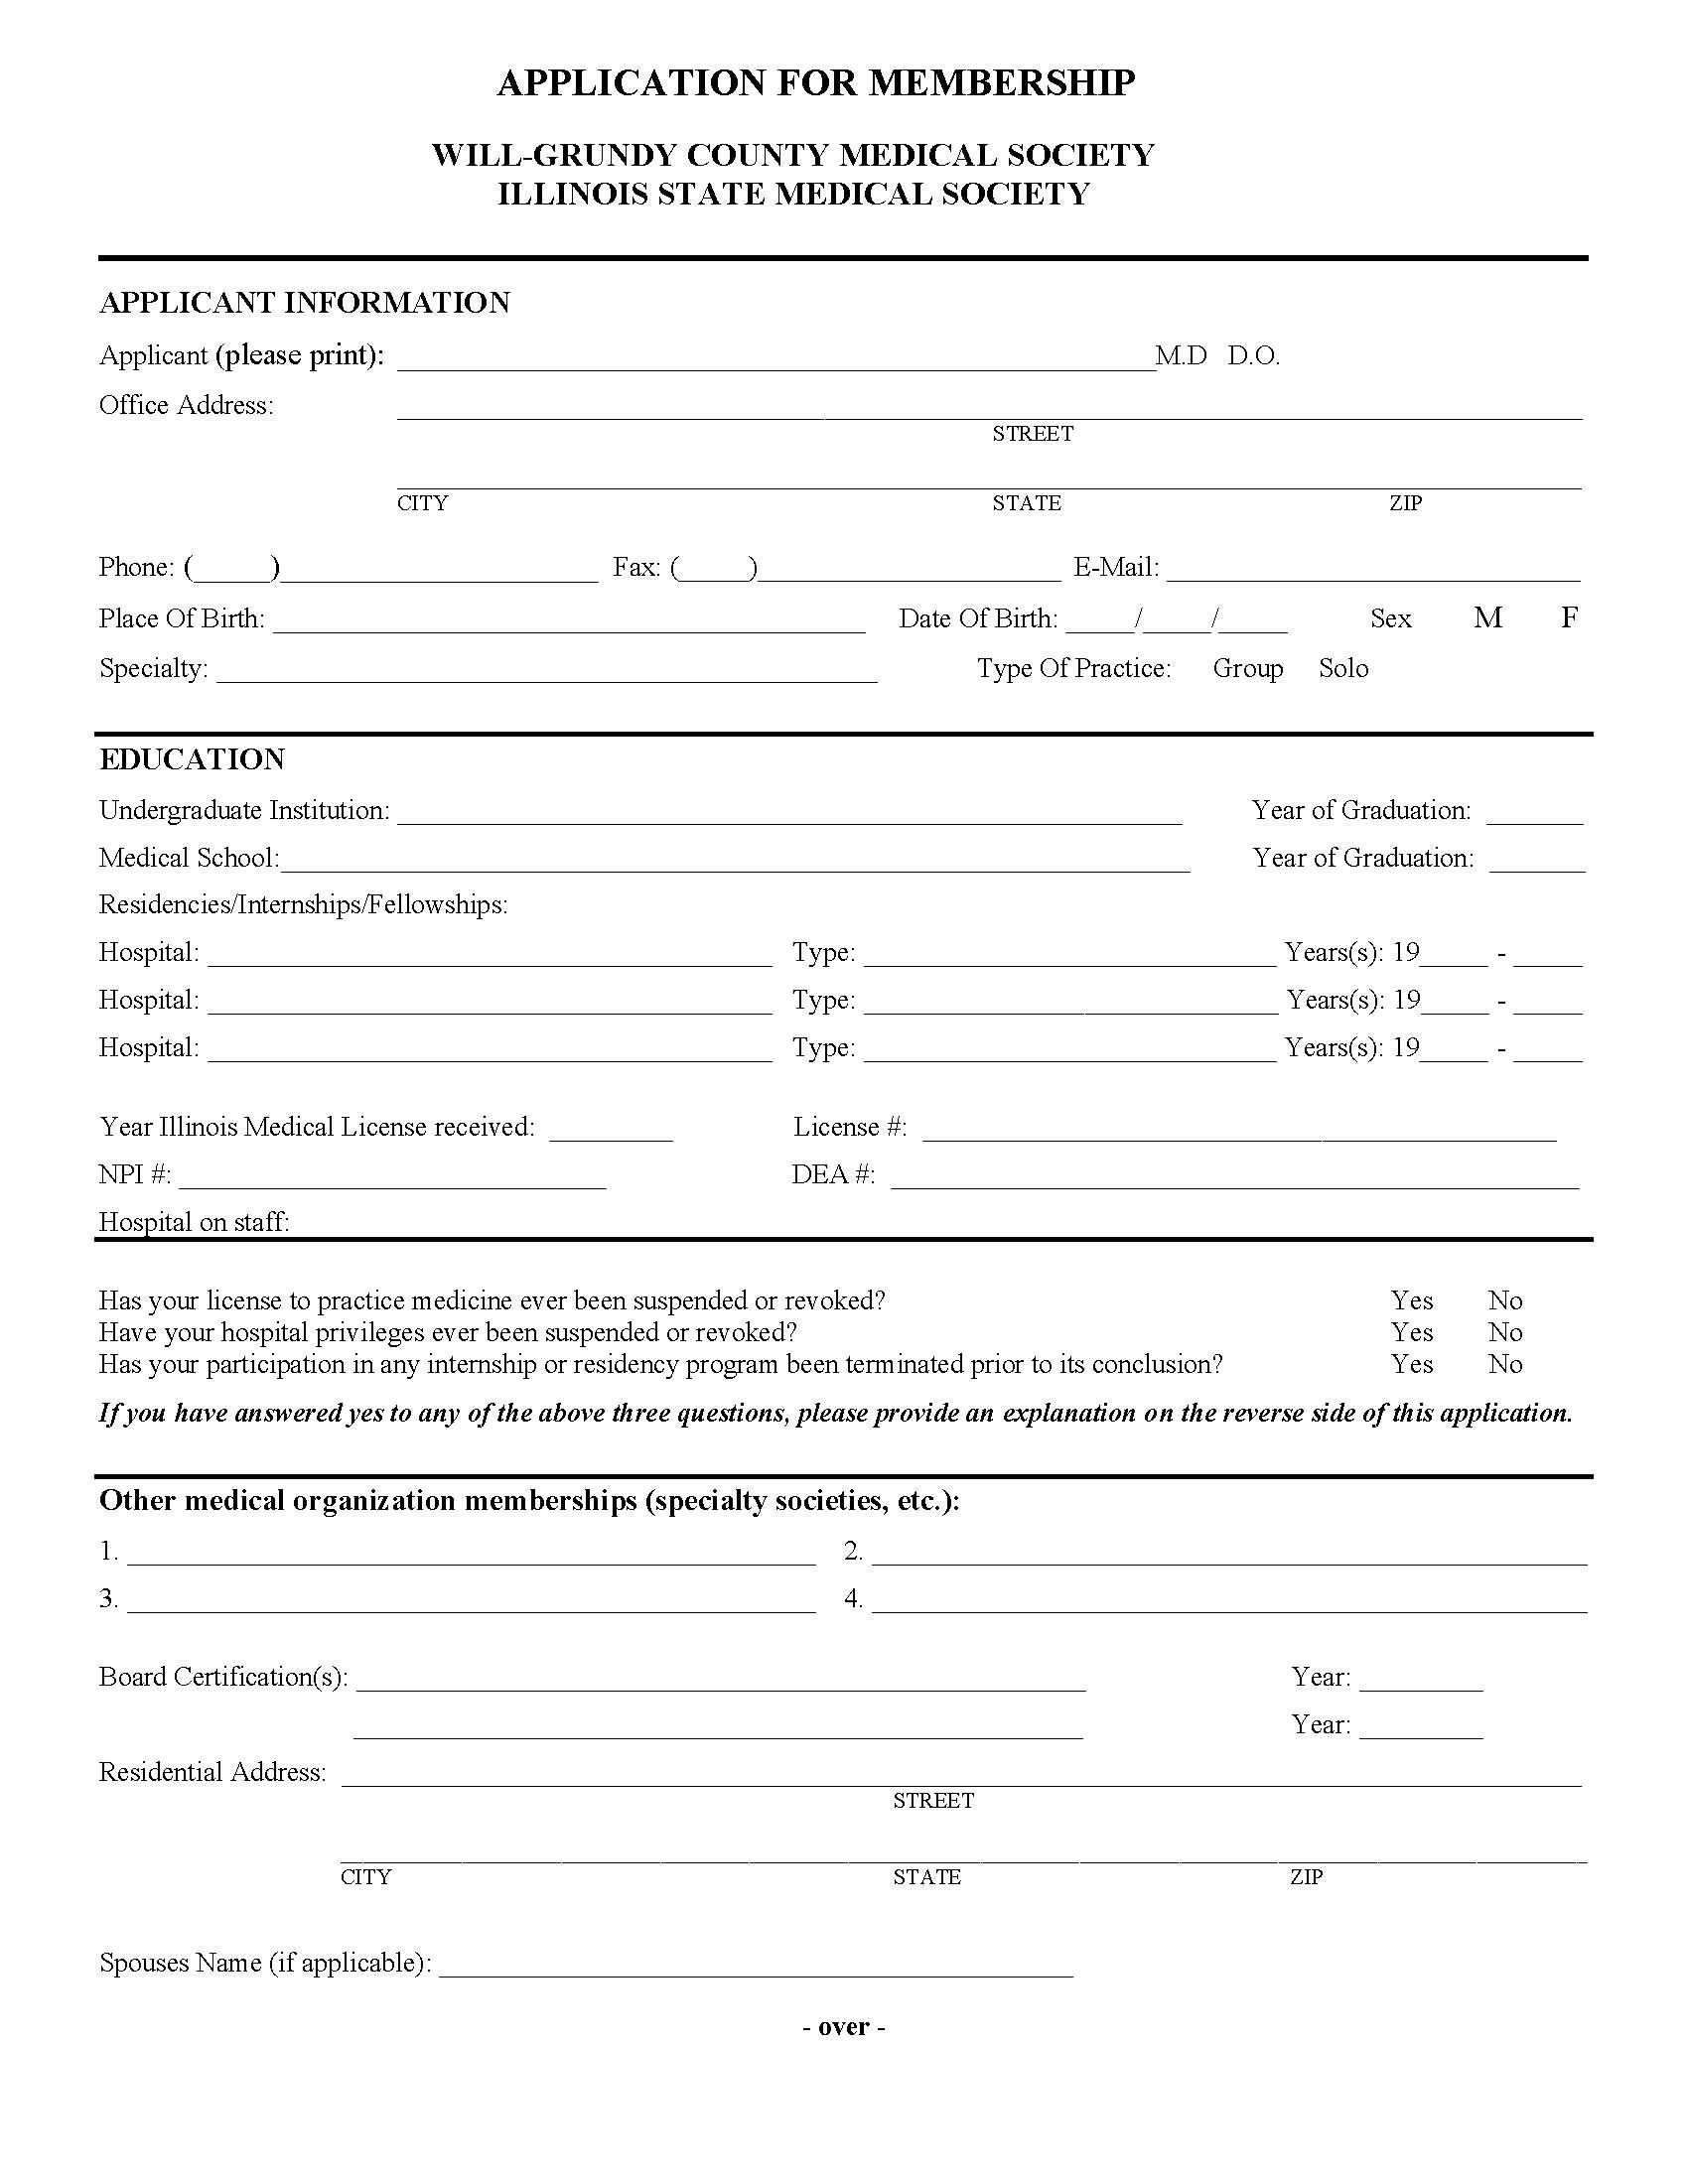 WGCMS application - Page 1